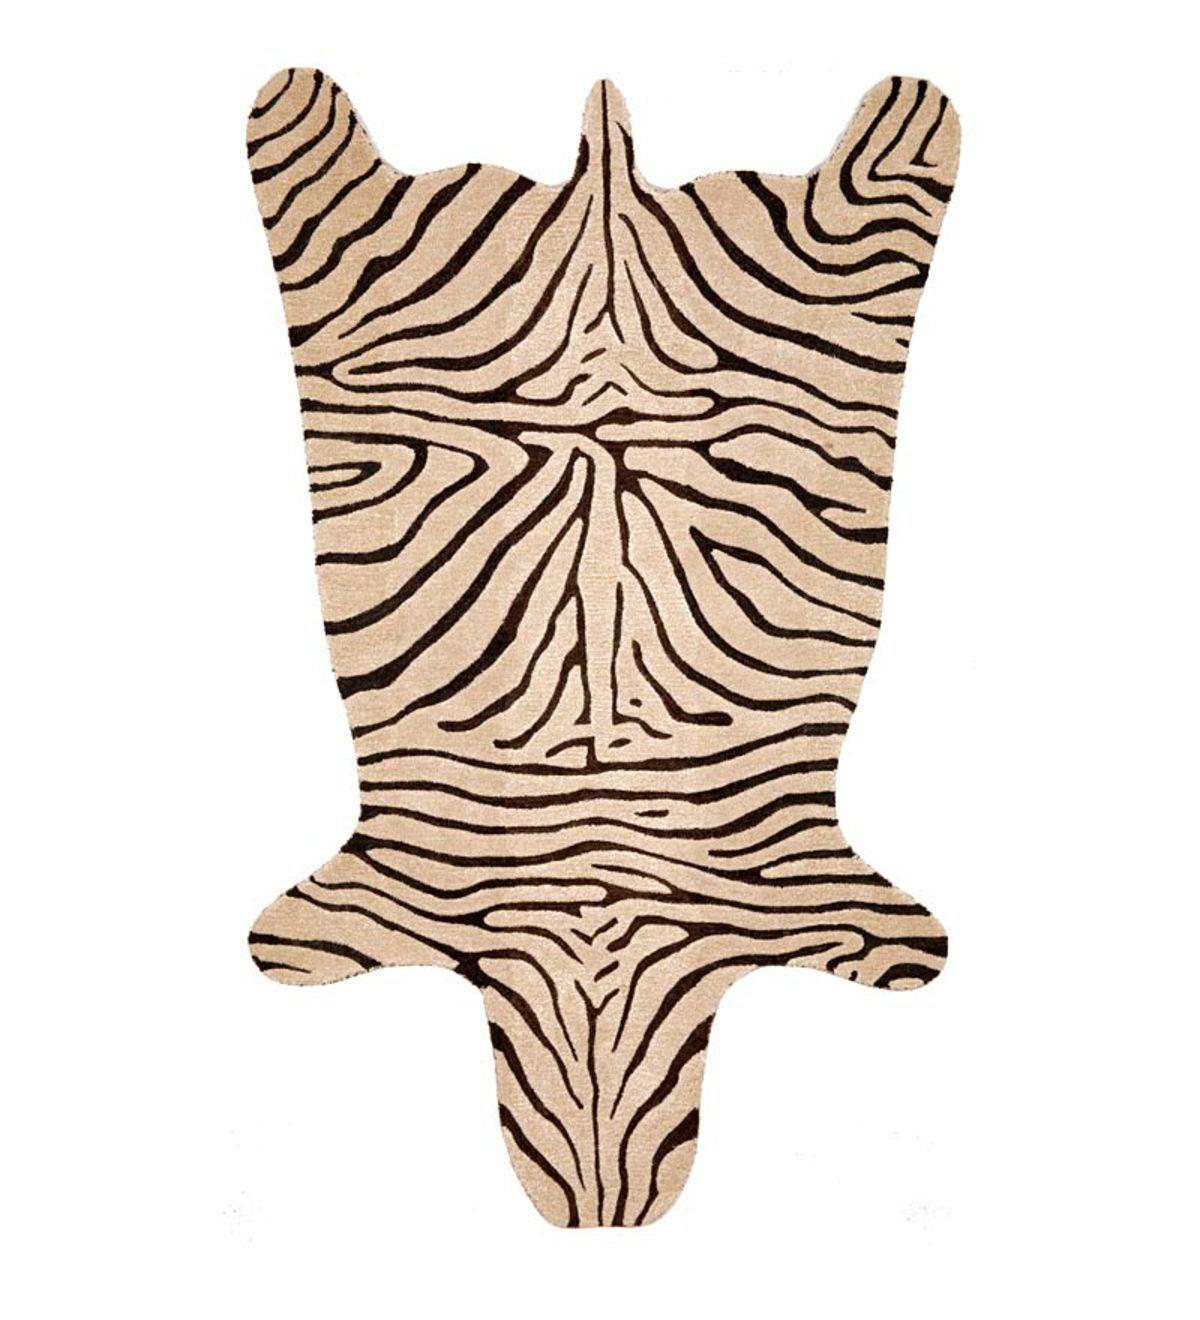 8 W X 10 L Indoor Faux Zebra Skin Rug